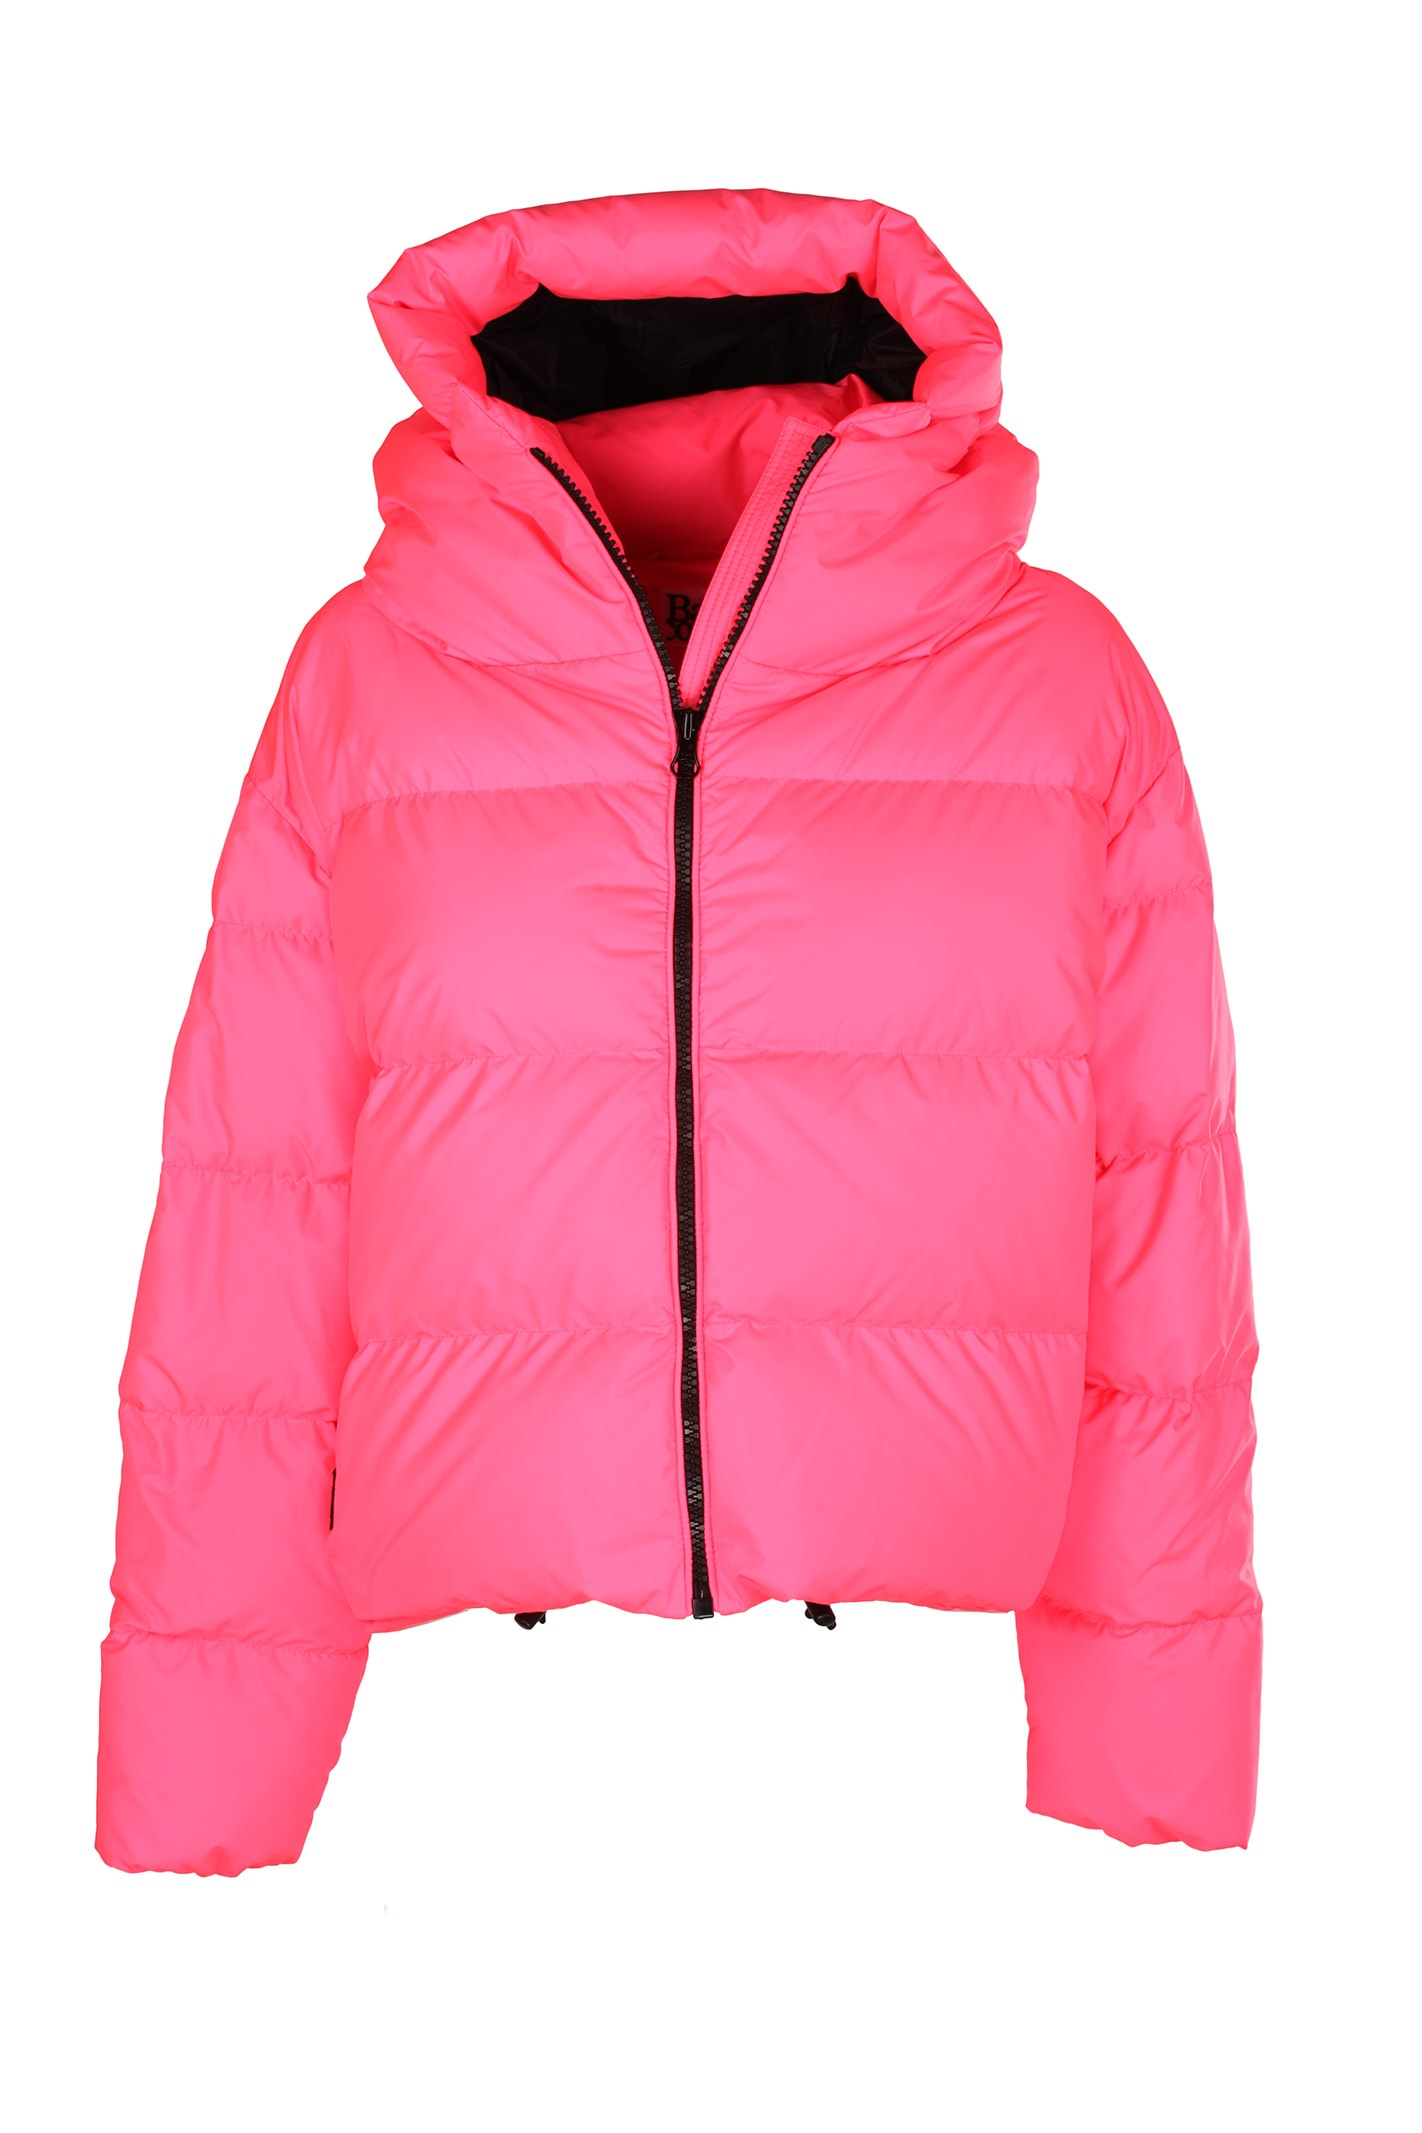 Photo of  Bacon Piumino Corto- shop Bacon jackets online sales